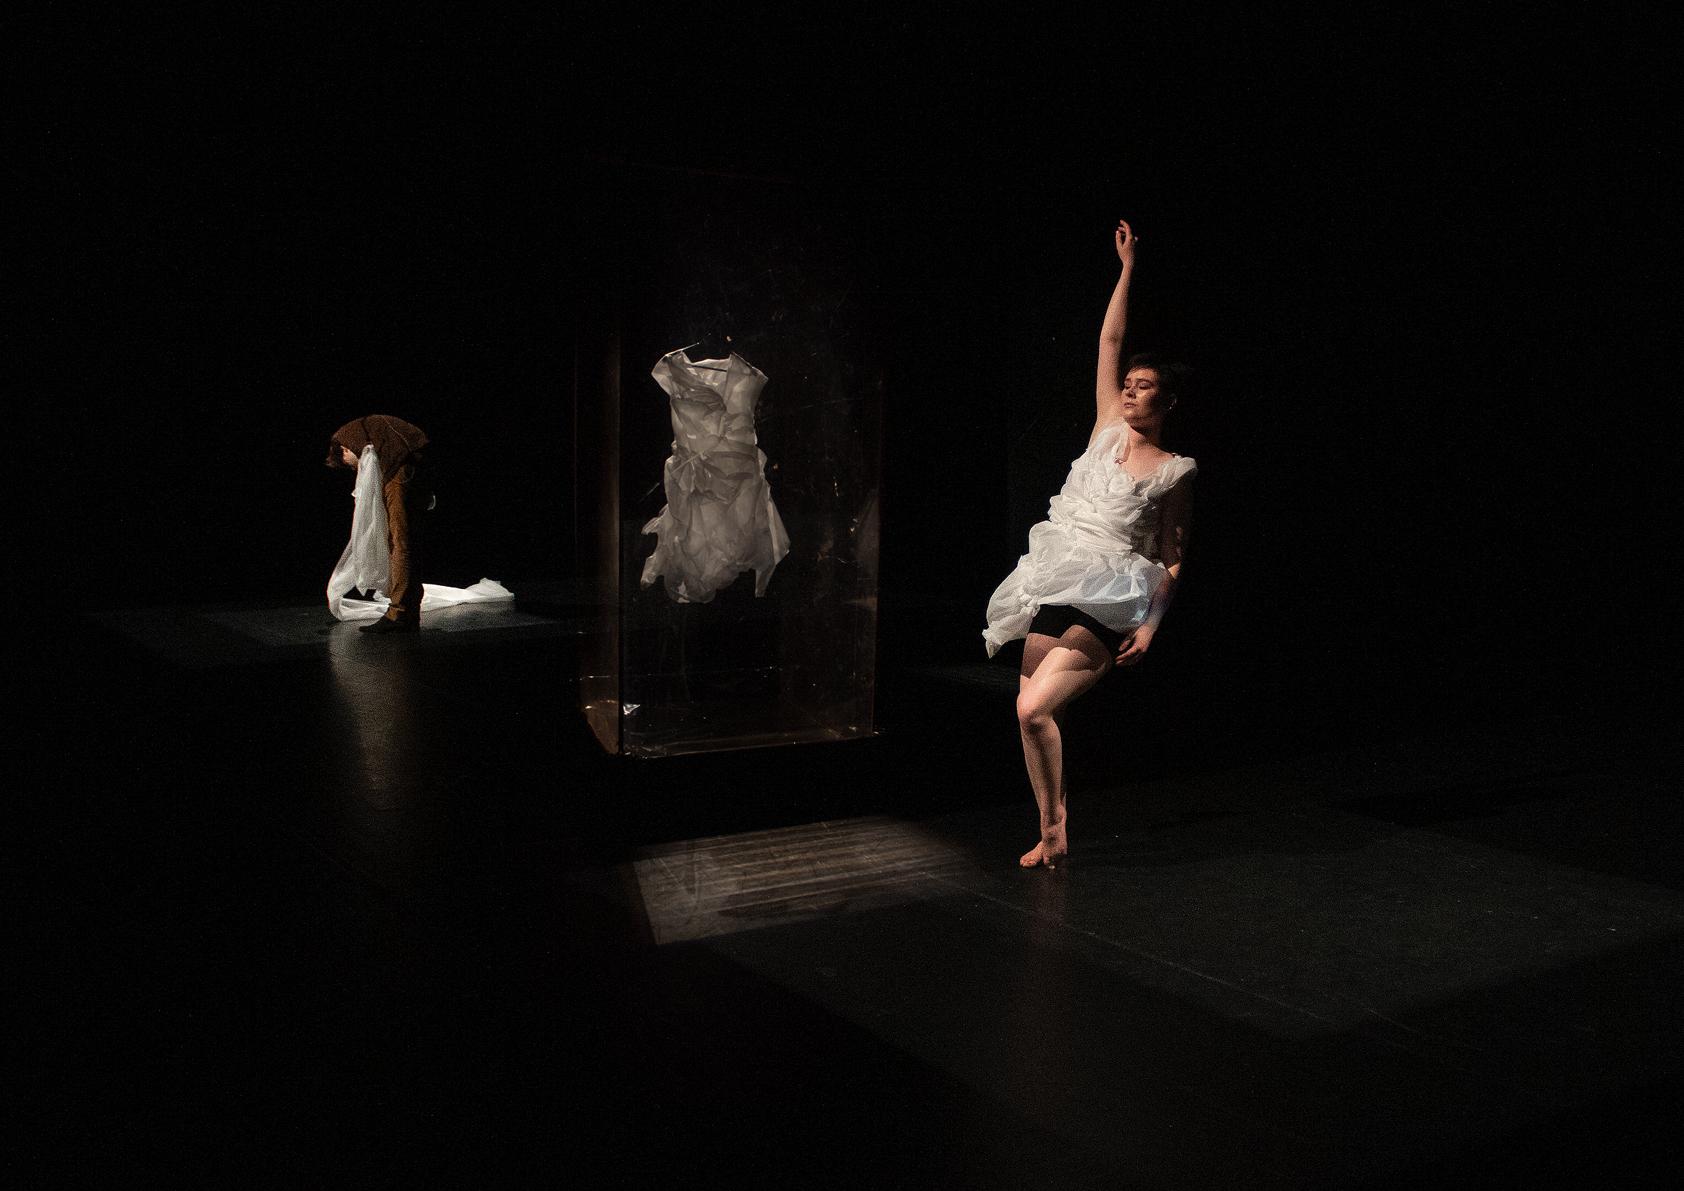 lichtontwerp | voorstelling MMM | foto: Anouk Steenbakkers